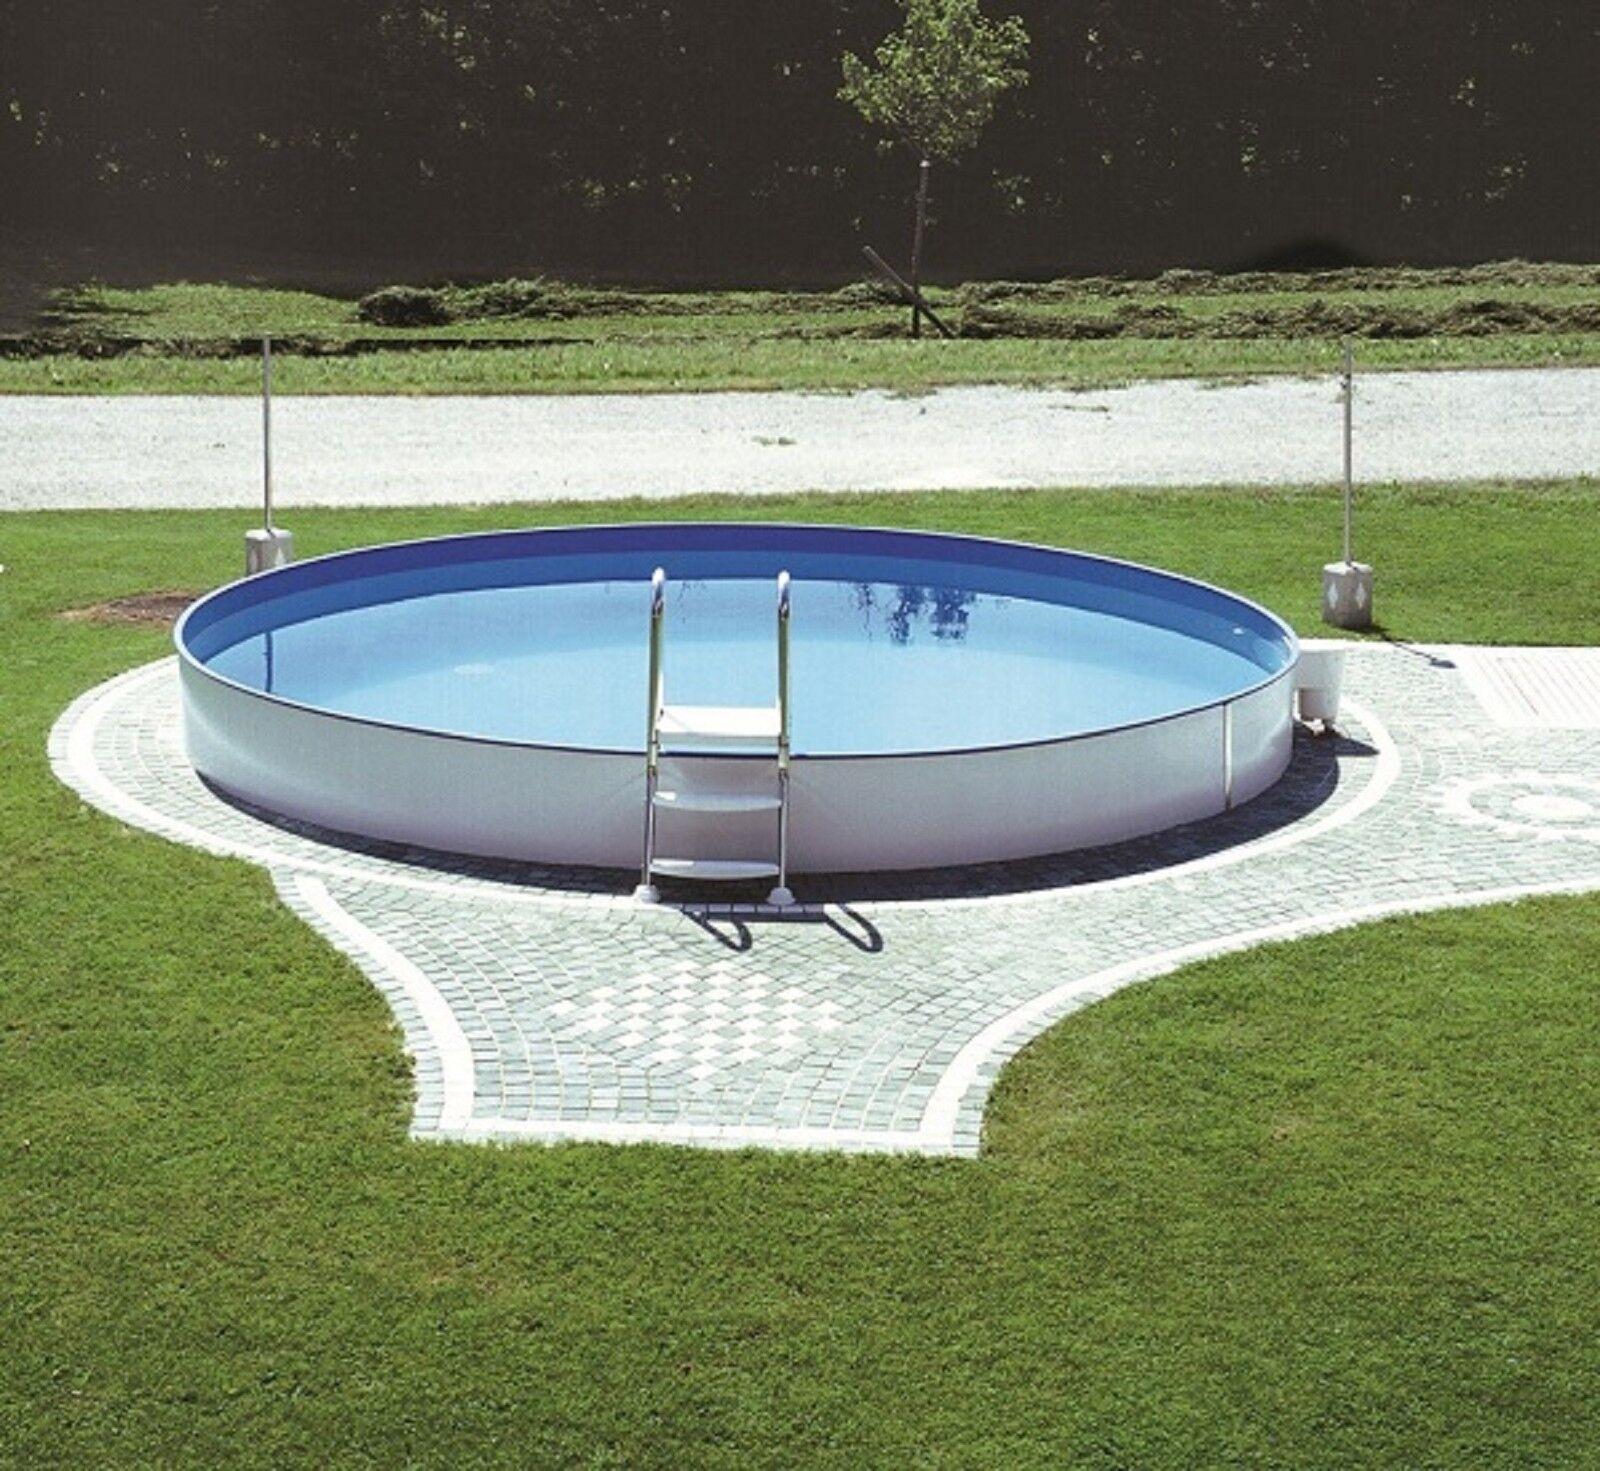 pool 3m durchmesser aufstellpools bauhaus stahlwandpool. Black Bedroom Furniture Sets. Home Design Ideas